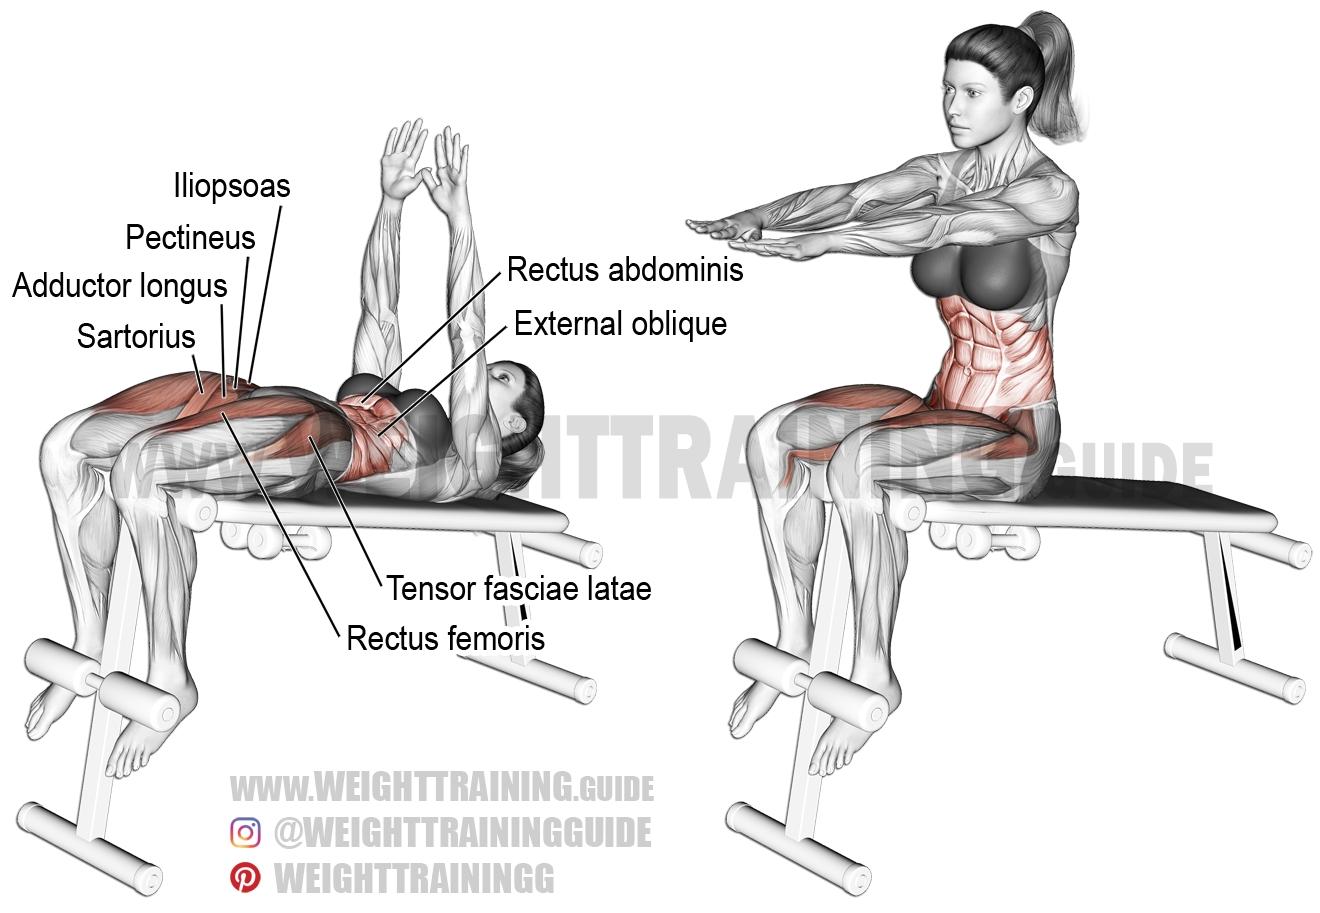 decline sit up a compound exercise target muscle rectus abdominis synergists obliques iliopsoas tensor fasciae latae rectus femoris pectineus